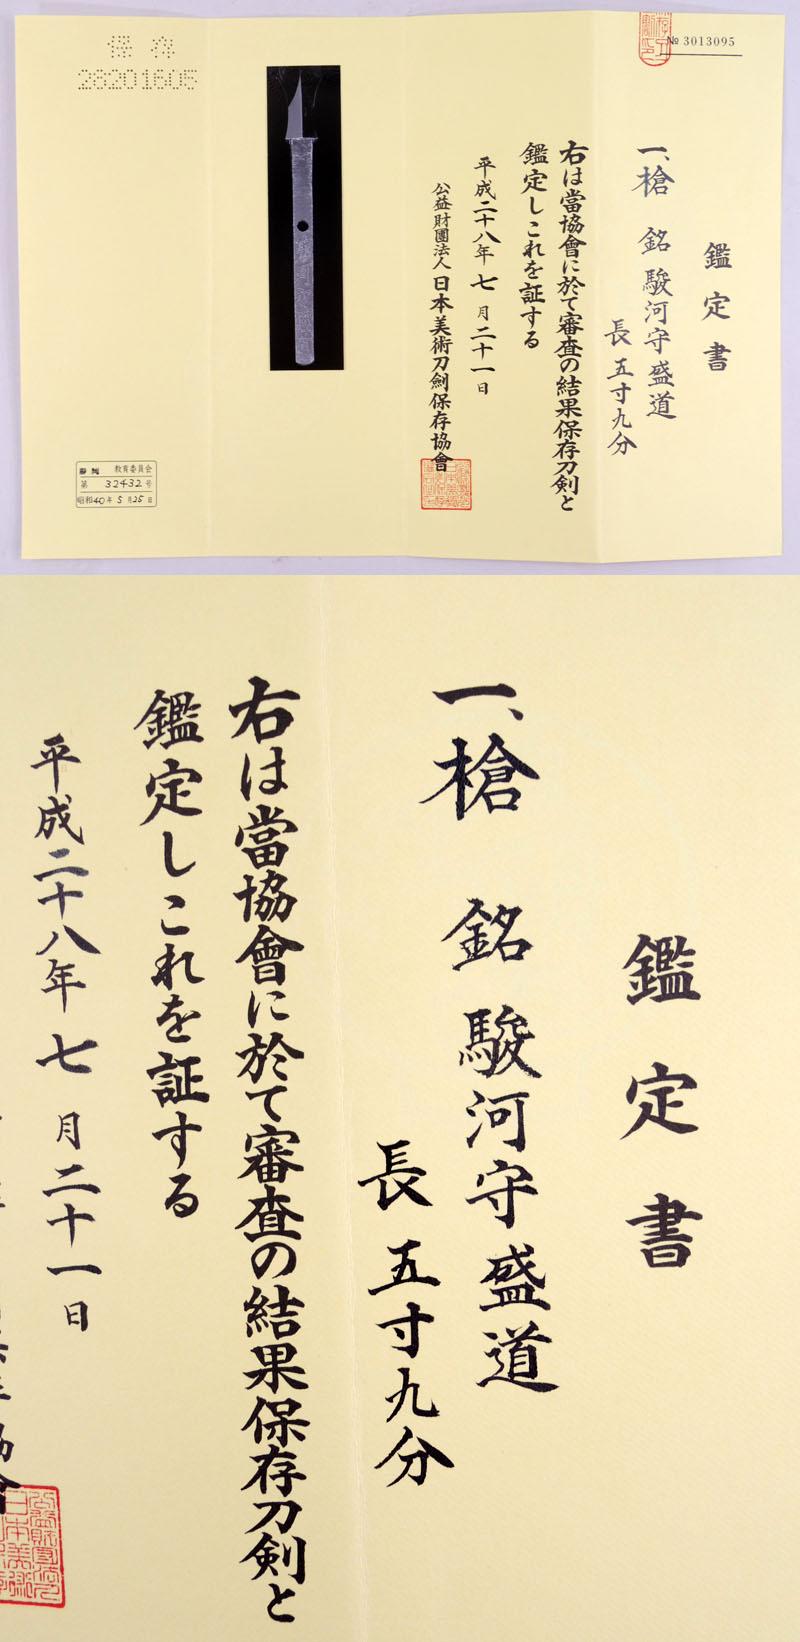 駿河守盛道 Picture of Certificate